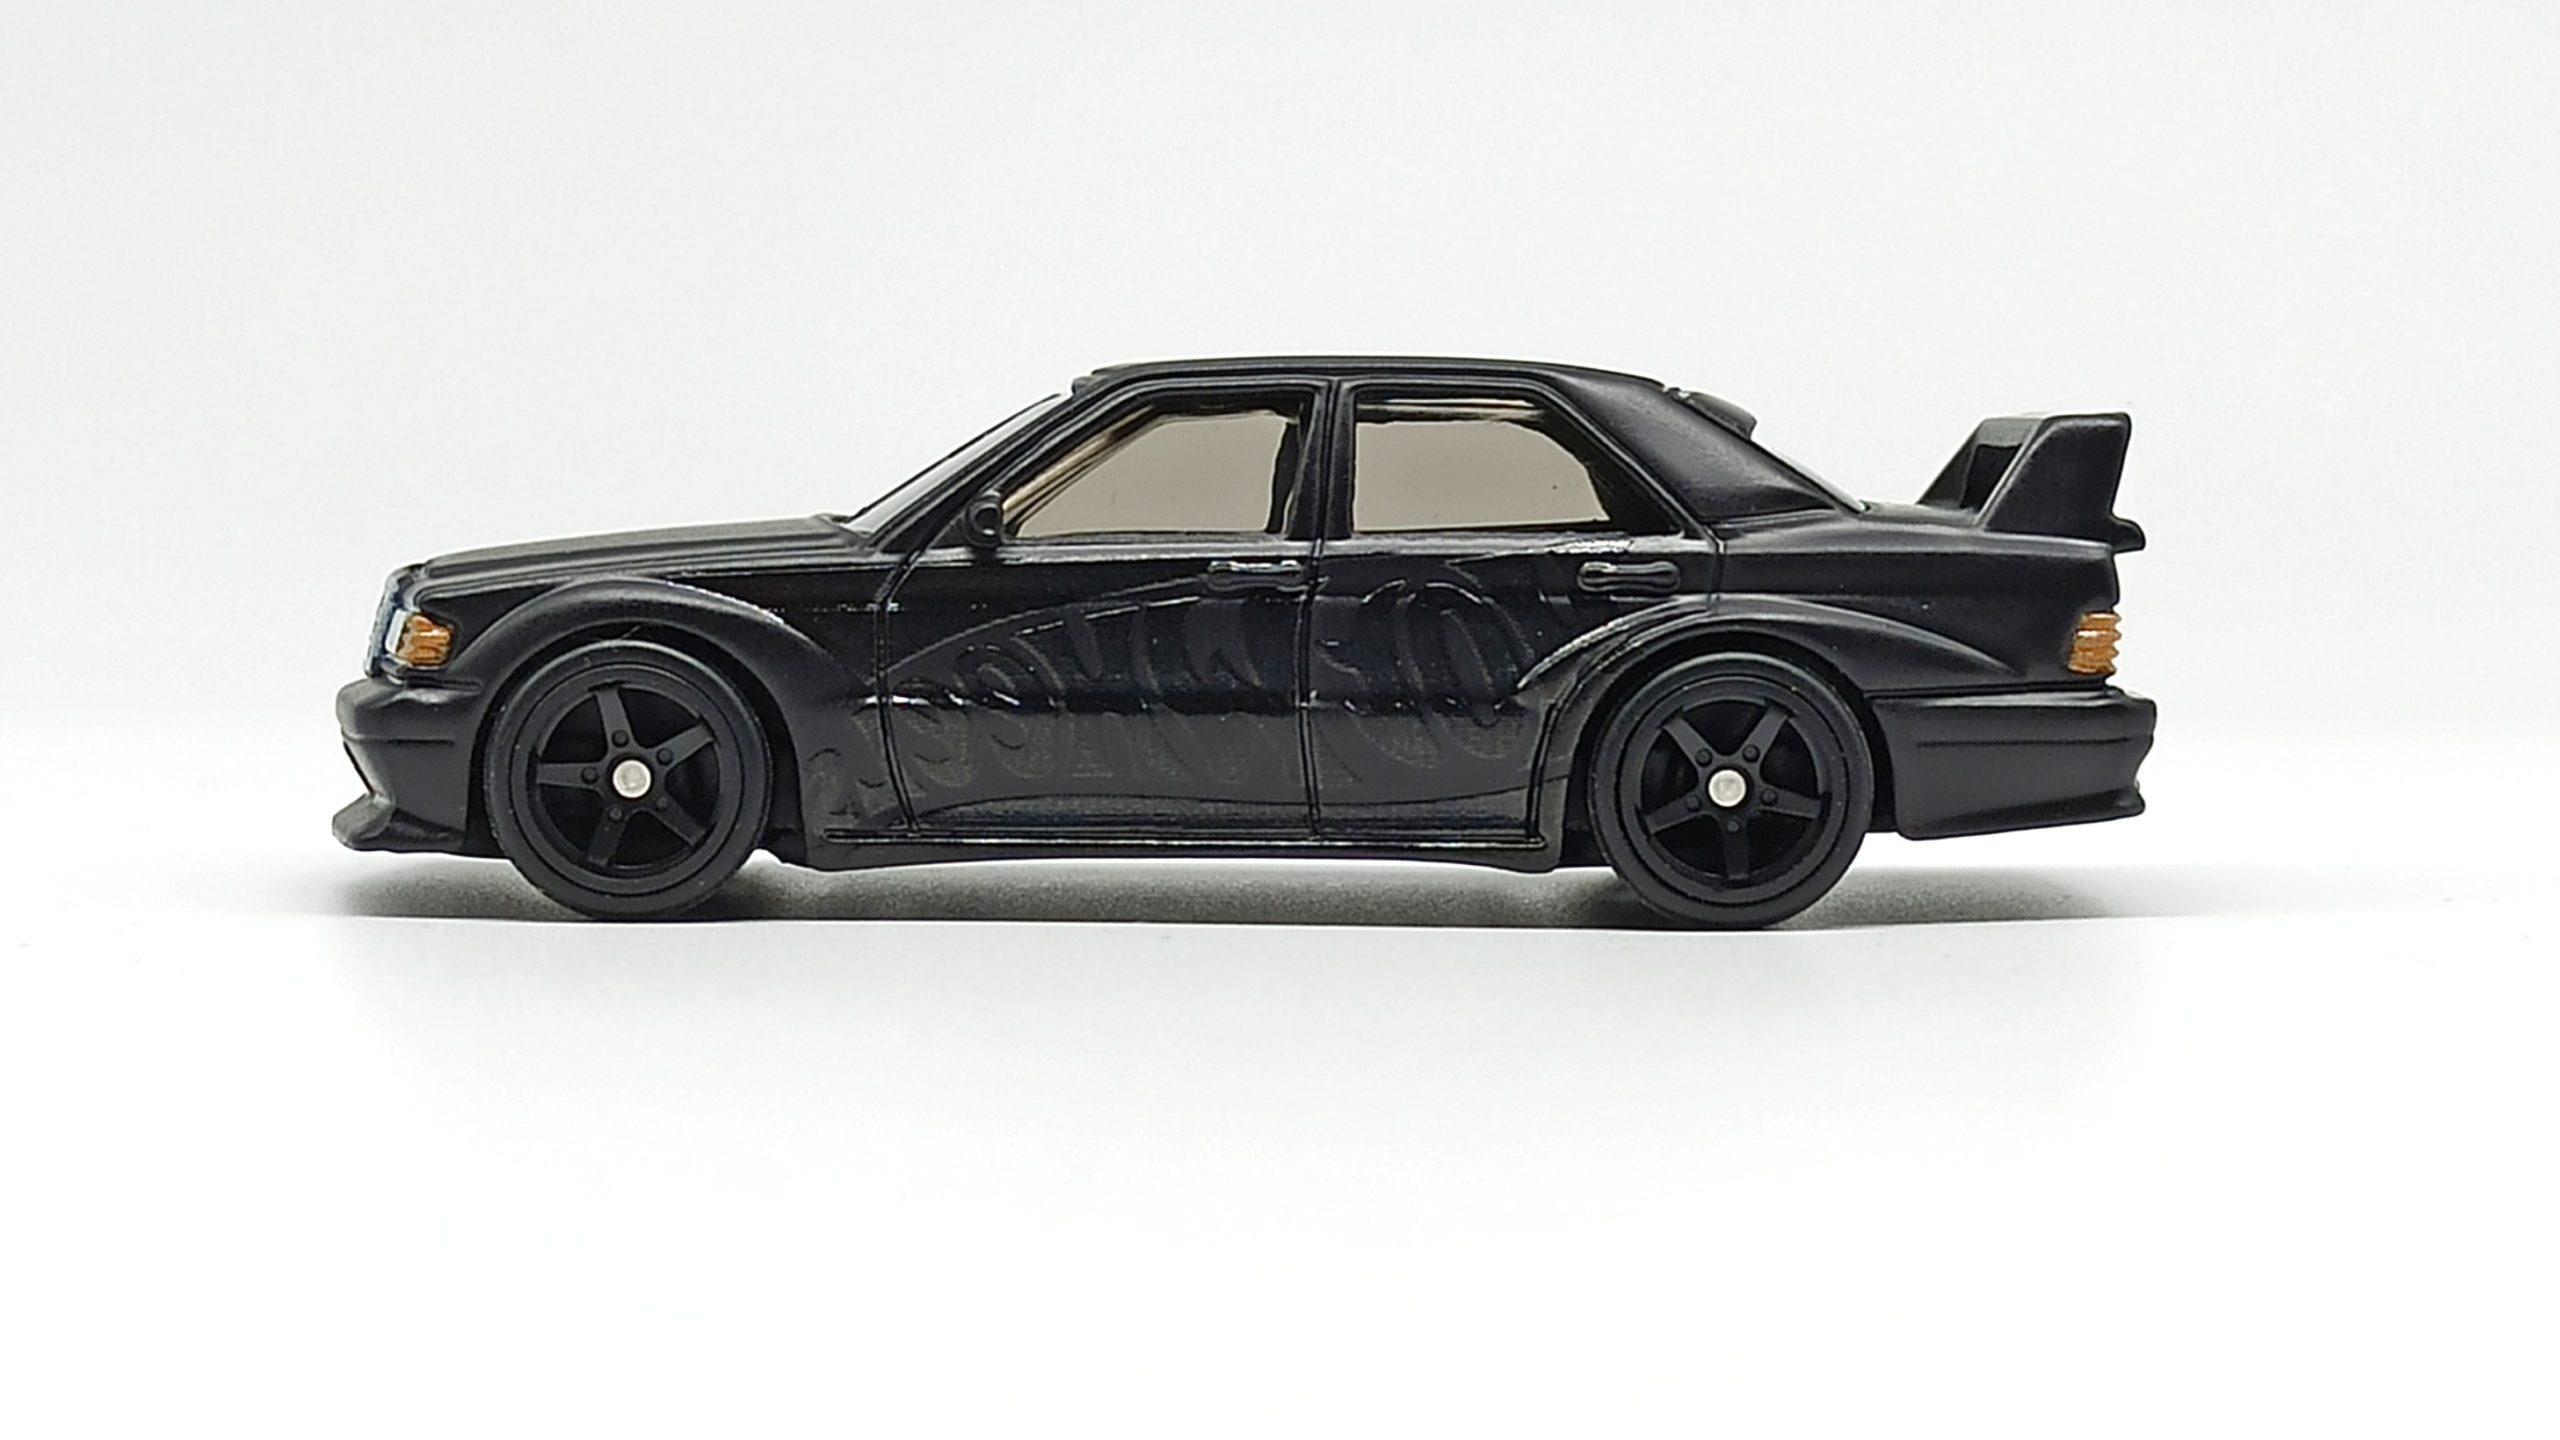 Hot Wheels Mercedes-Benz 190E 2.5-16 EVO II (DWH66) 2021 Display Case Exclusive black side